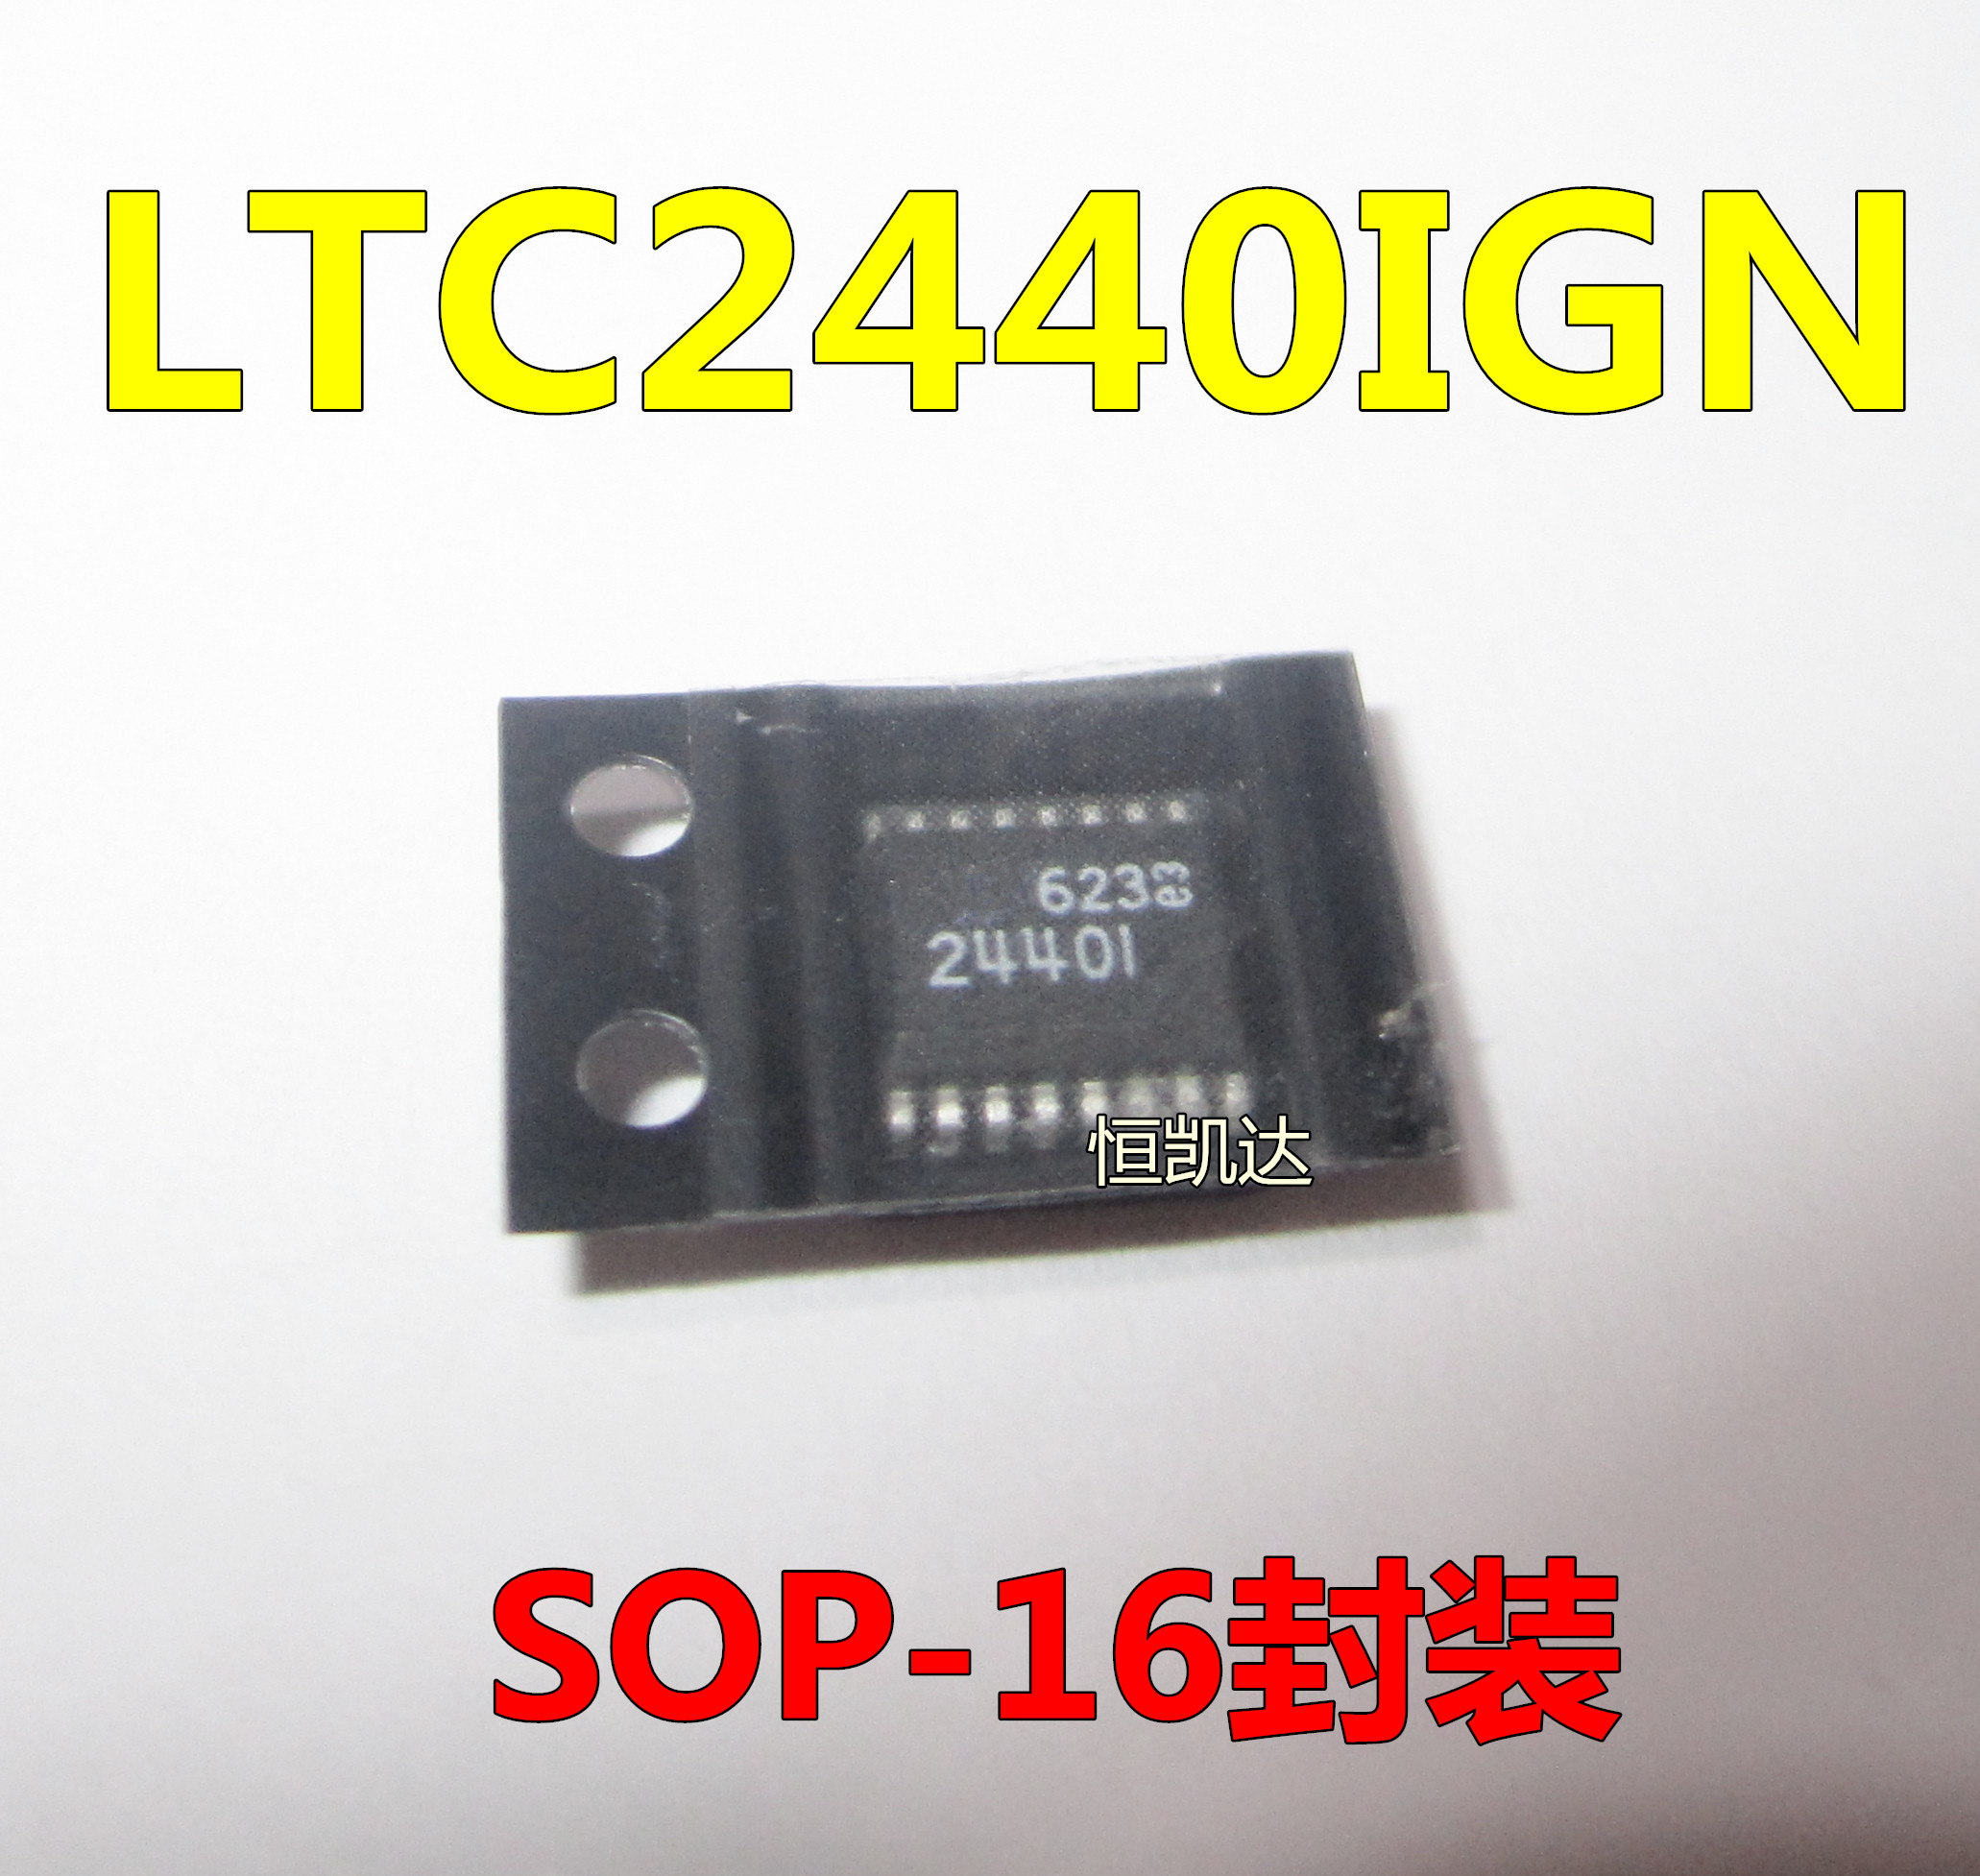 1pcs/lot LTC2440 LTC2440CGN SSOP161pcs/lot LTC2440 LTC2440CGN SSOP16